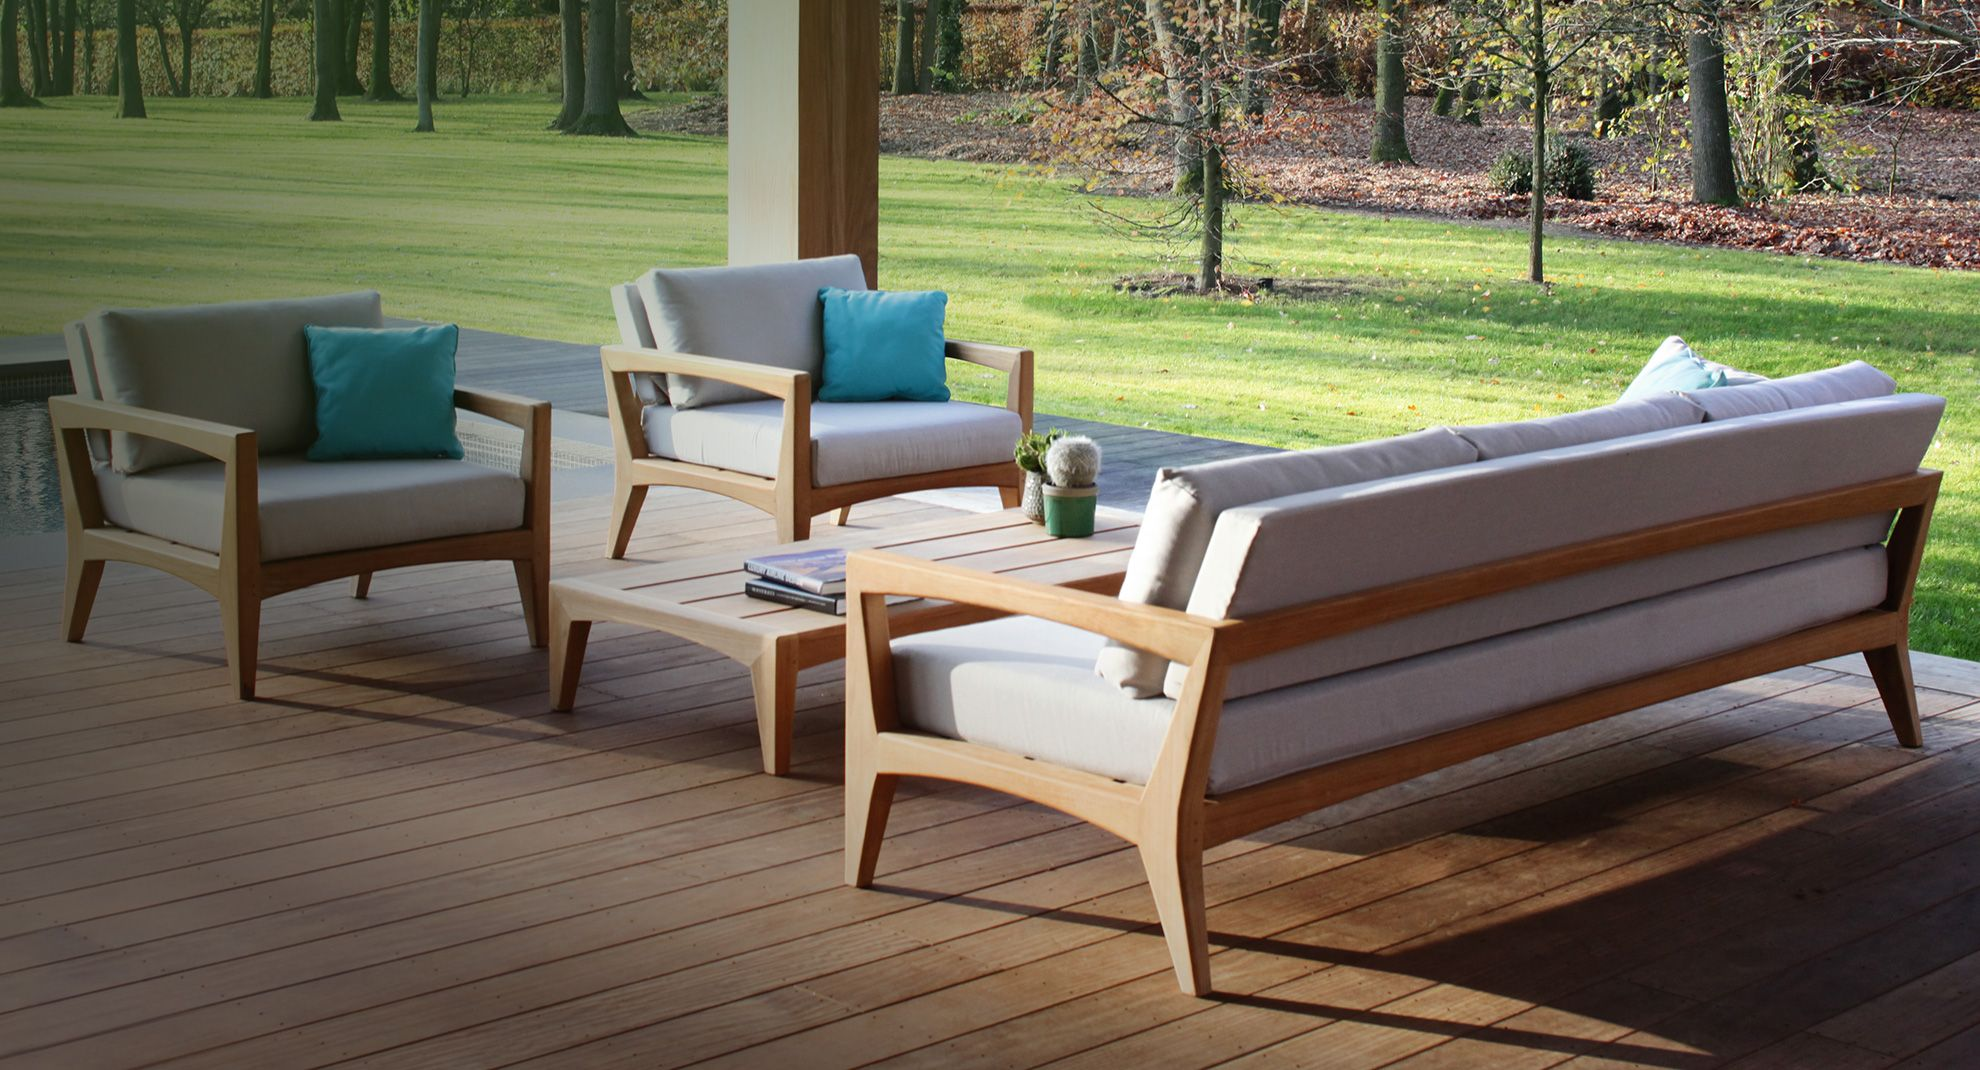 938c48569a Zenhit by Royal Botania, redifining outdoor luxury! / www.royalbotania.com # outdoor #teak #luxury